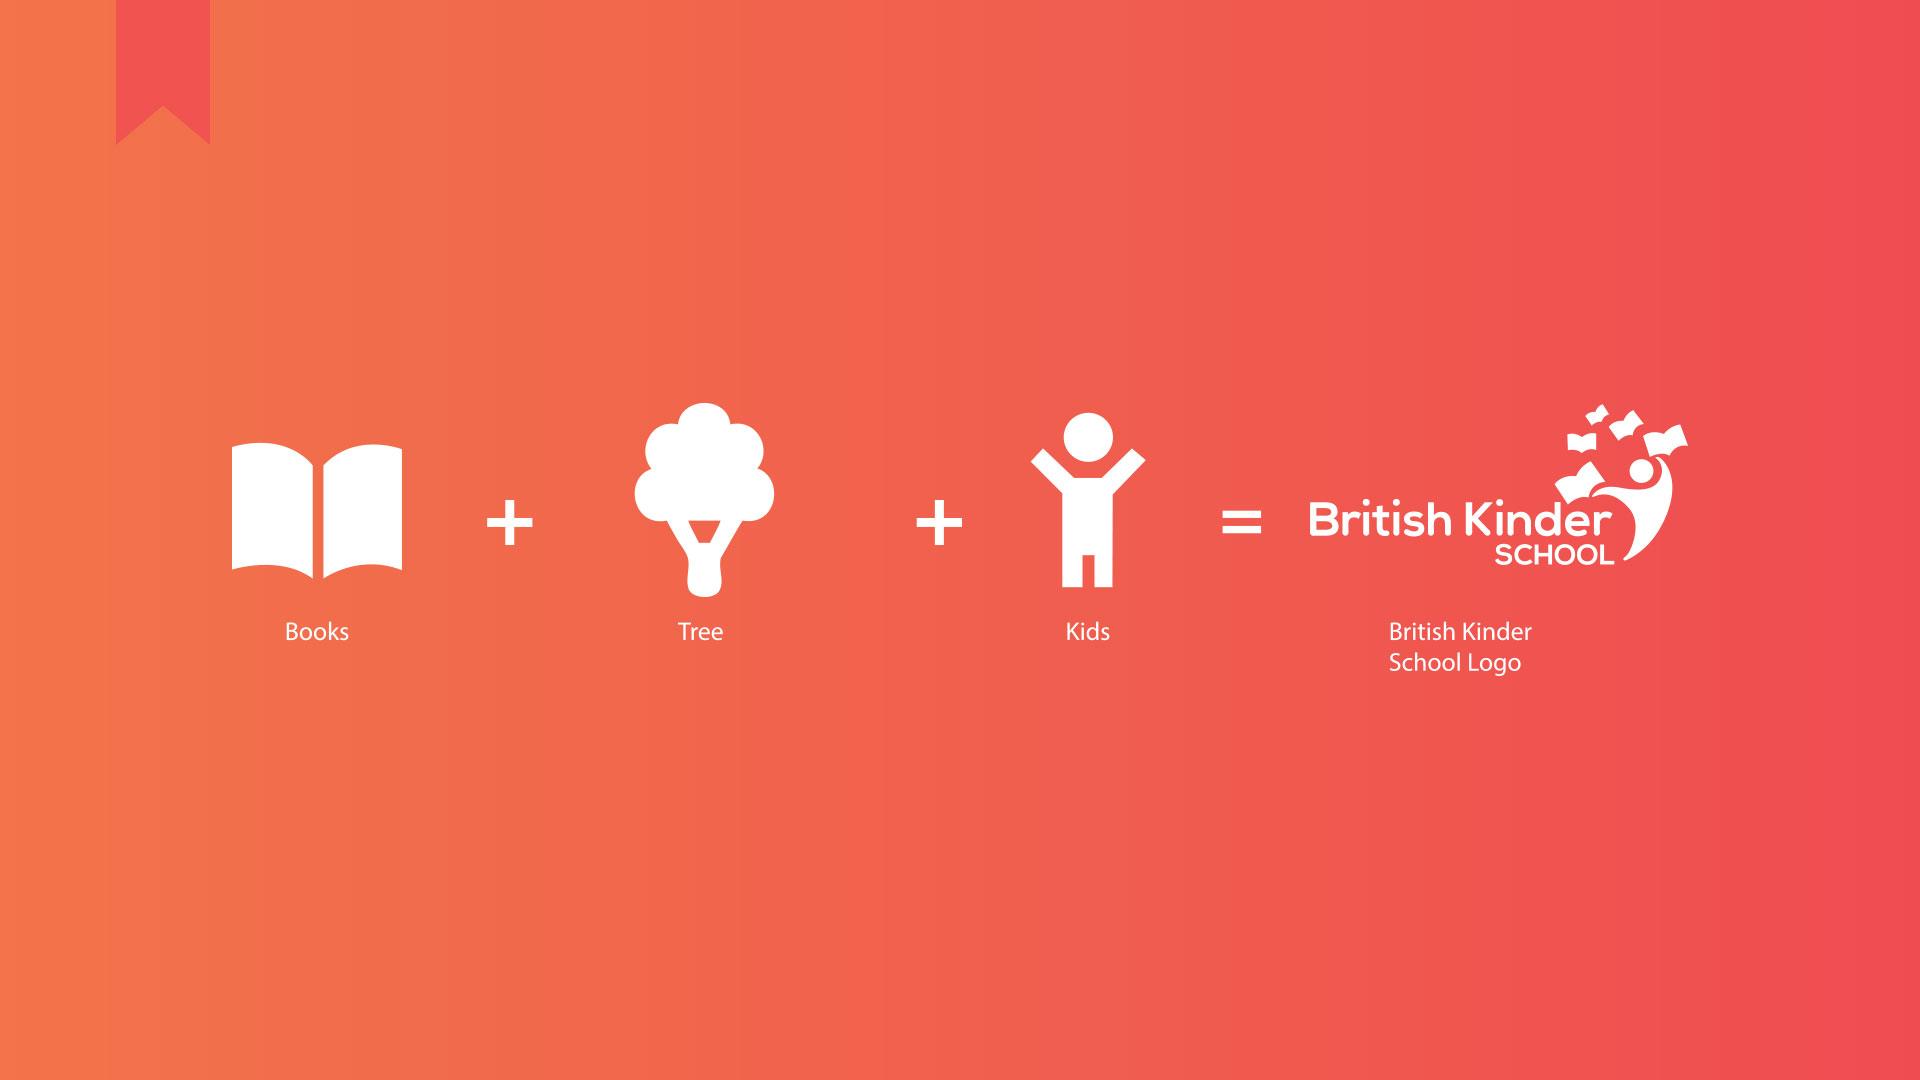 British Kinder School Logo Design Concept